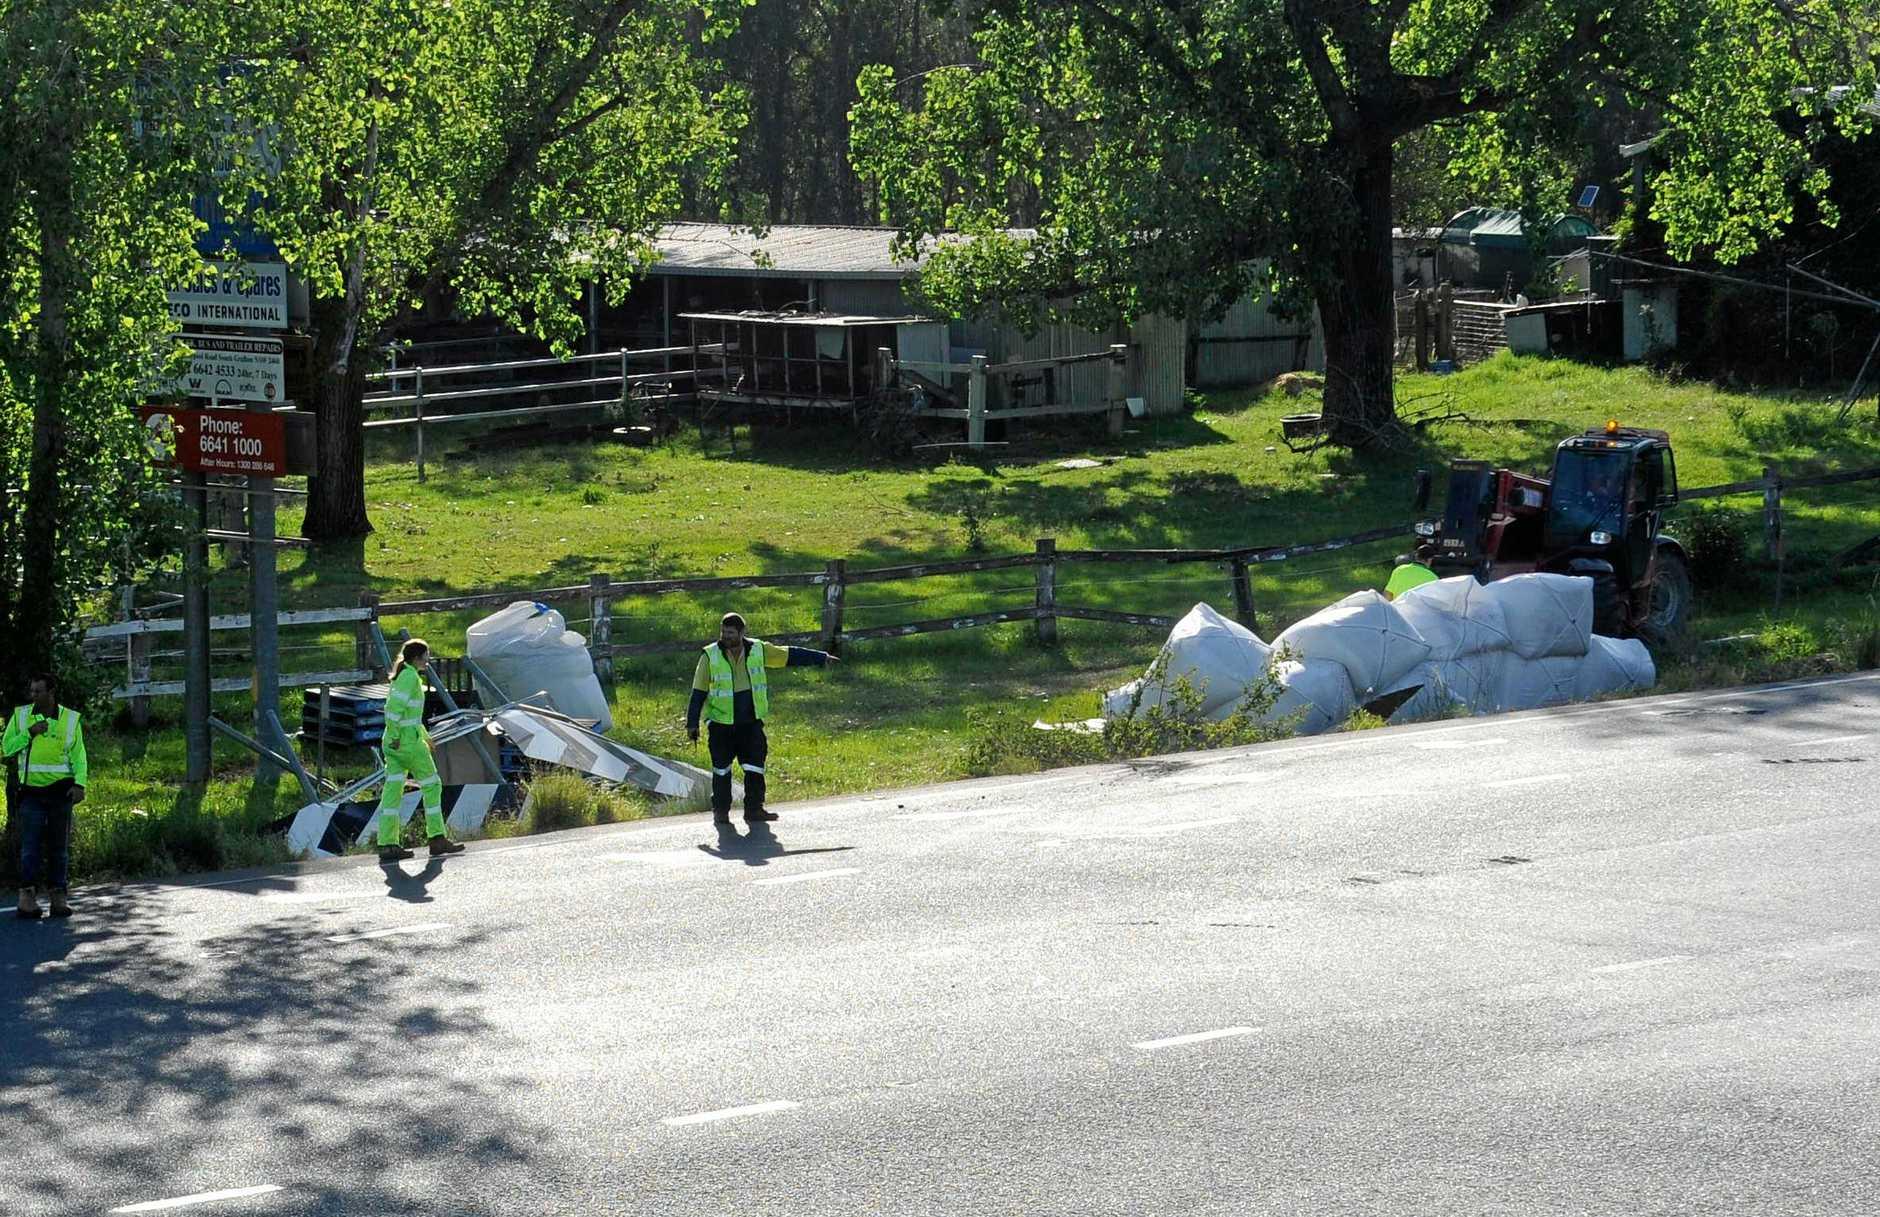 The debris leftover following Friday morning's crash.